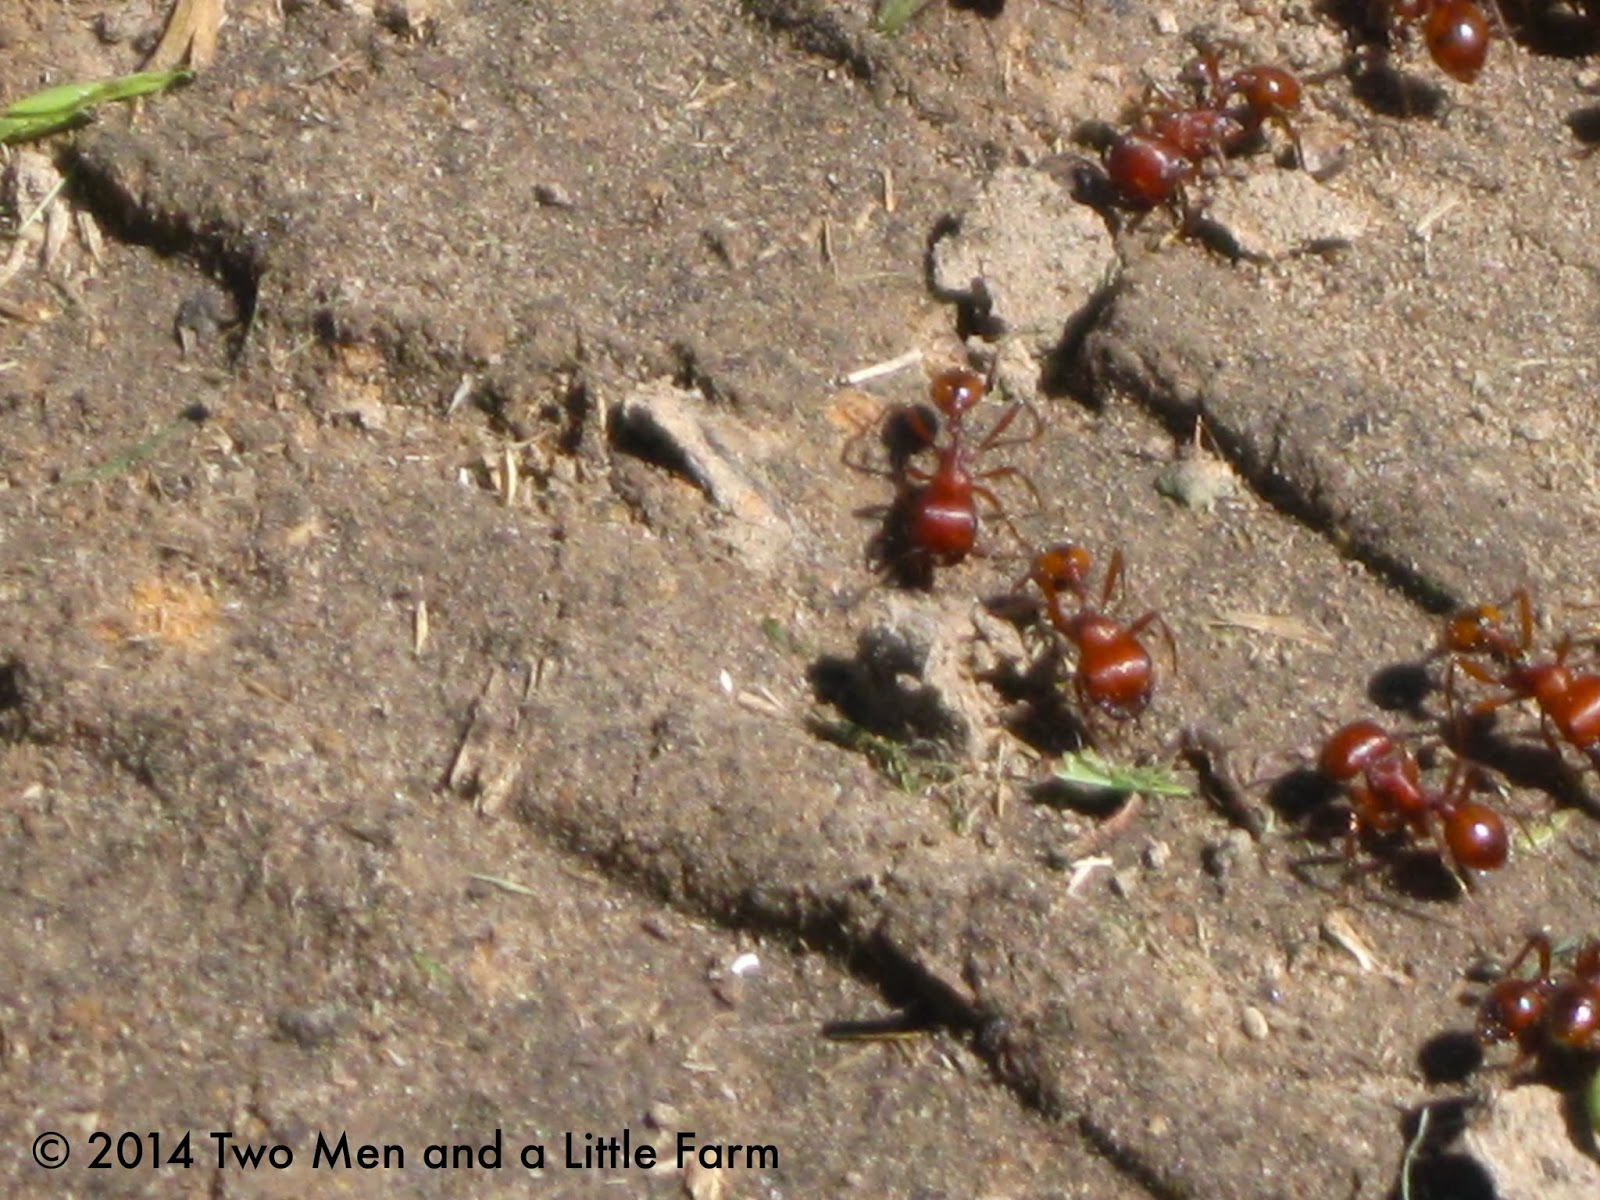 To Kill Bed Bugs: Spray To Kill Bed Bugs India